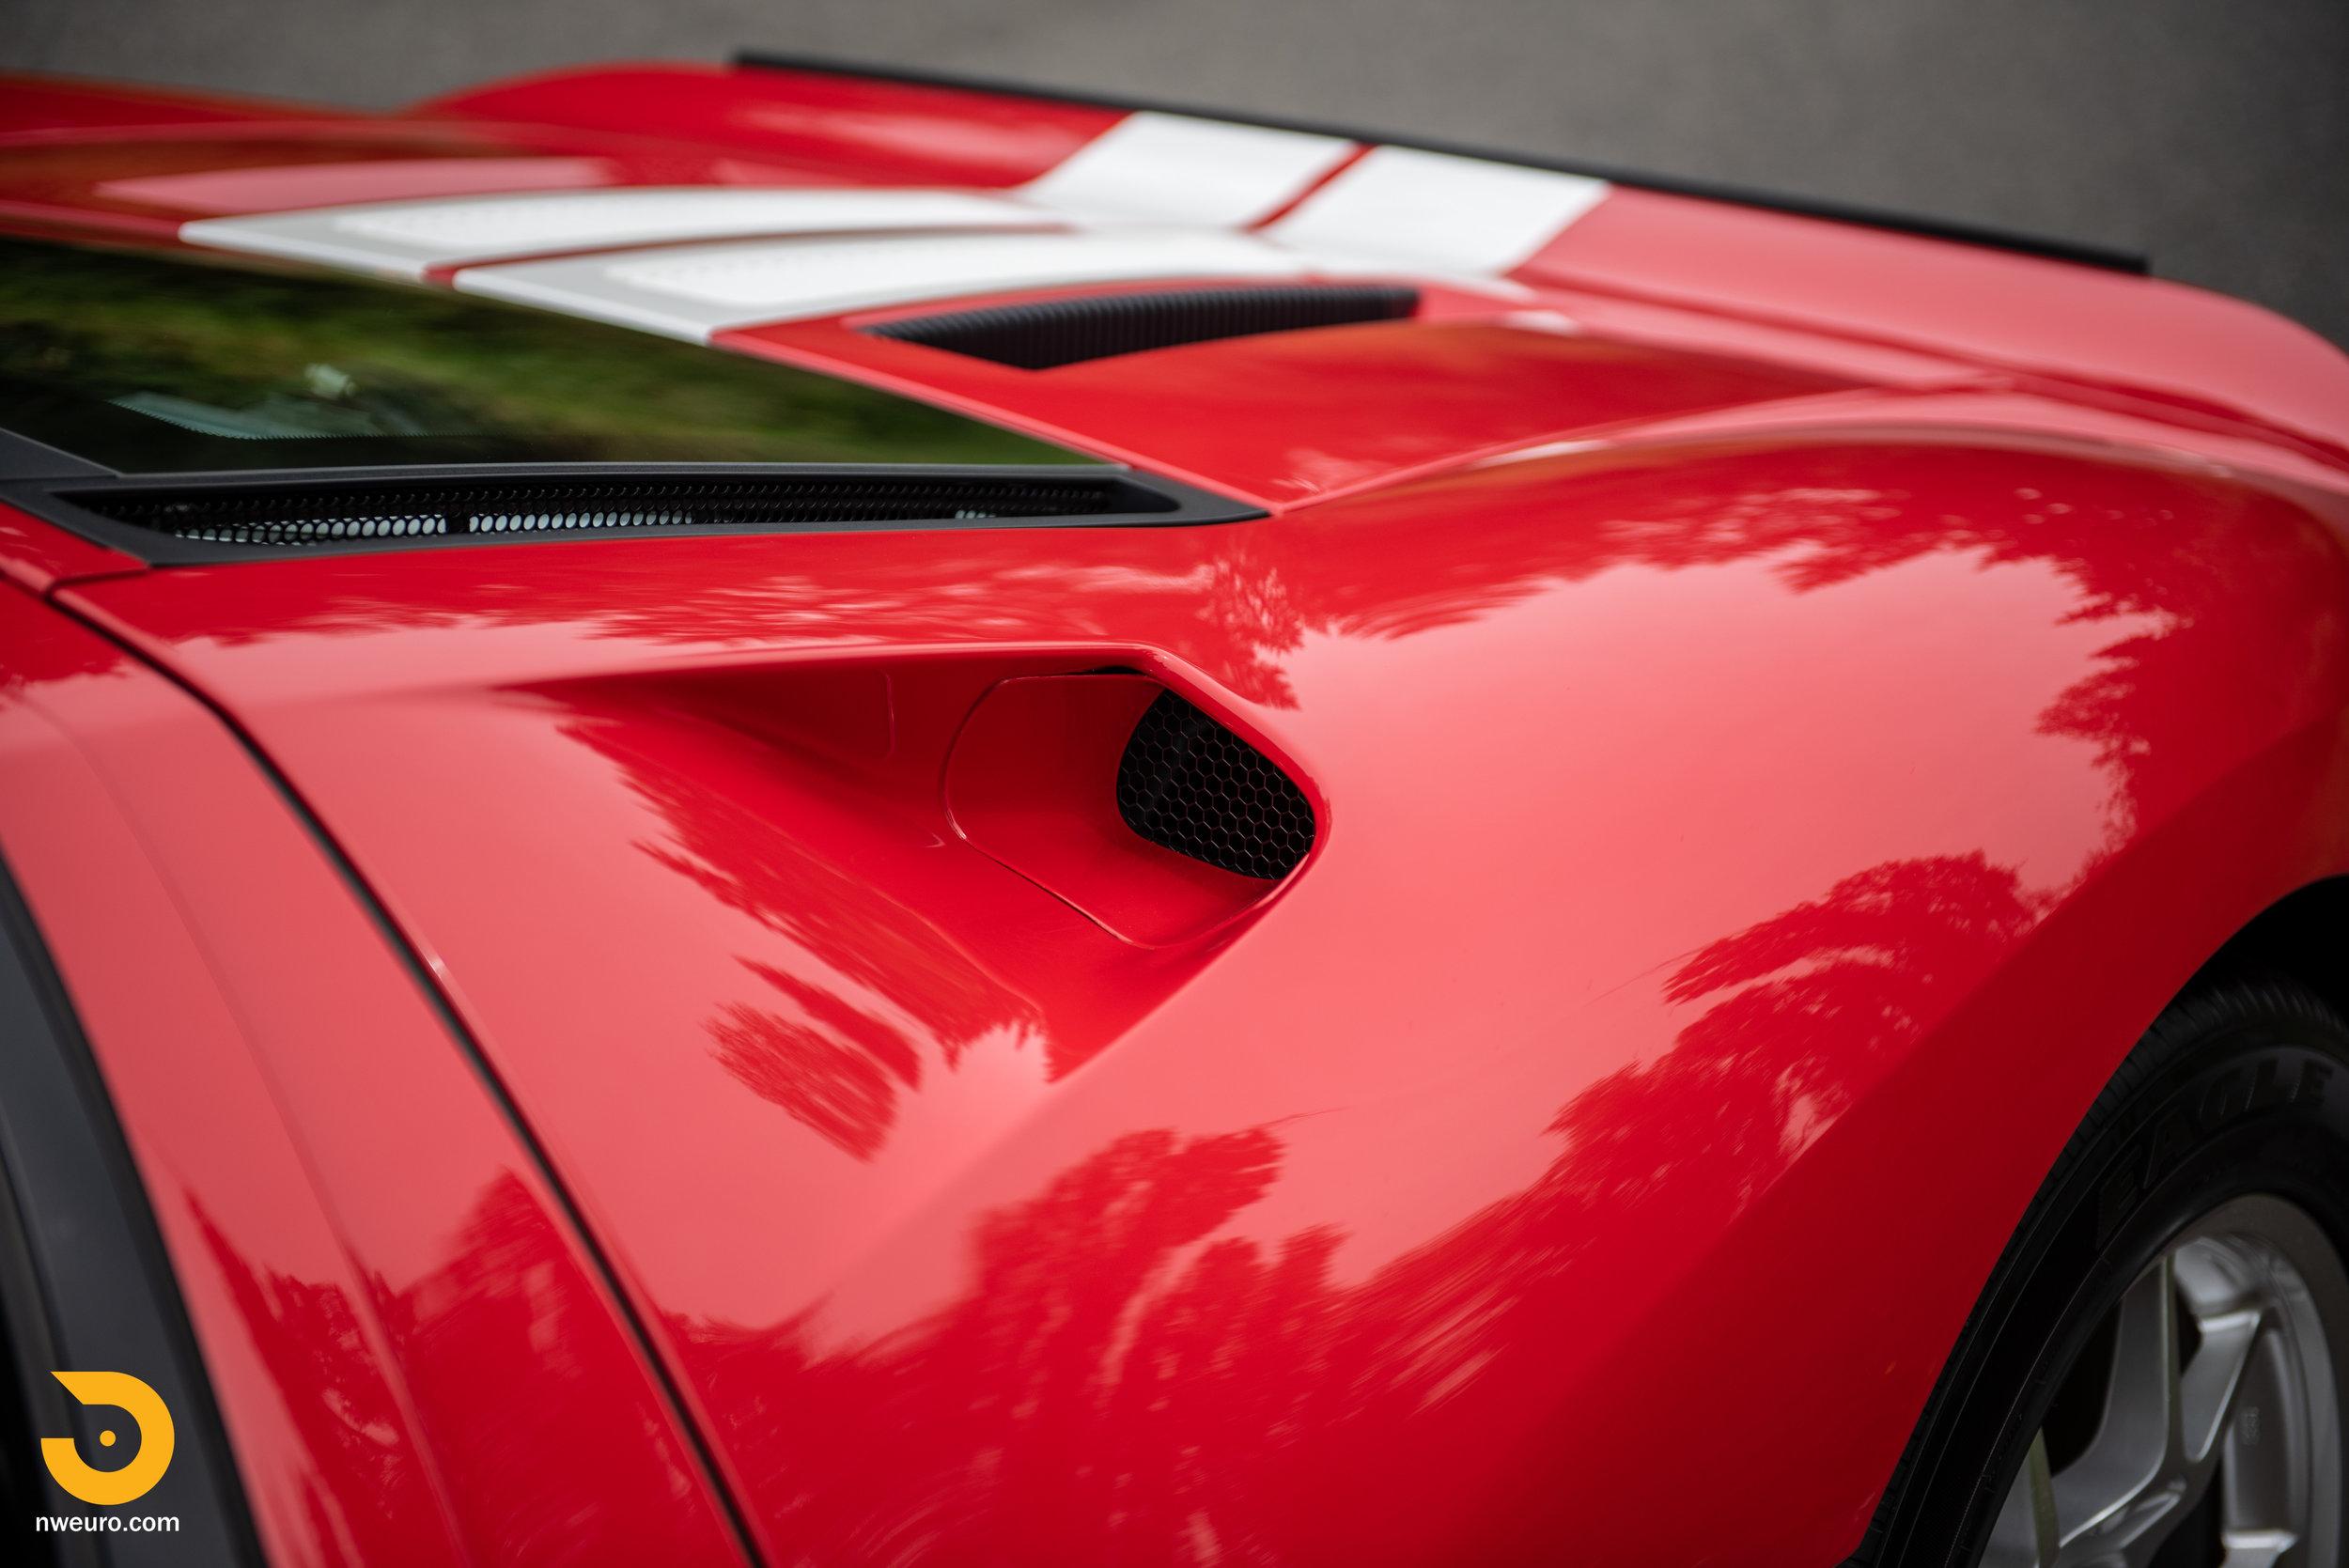 2005 Ford GT Red-96.jpg